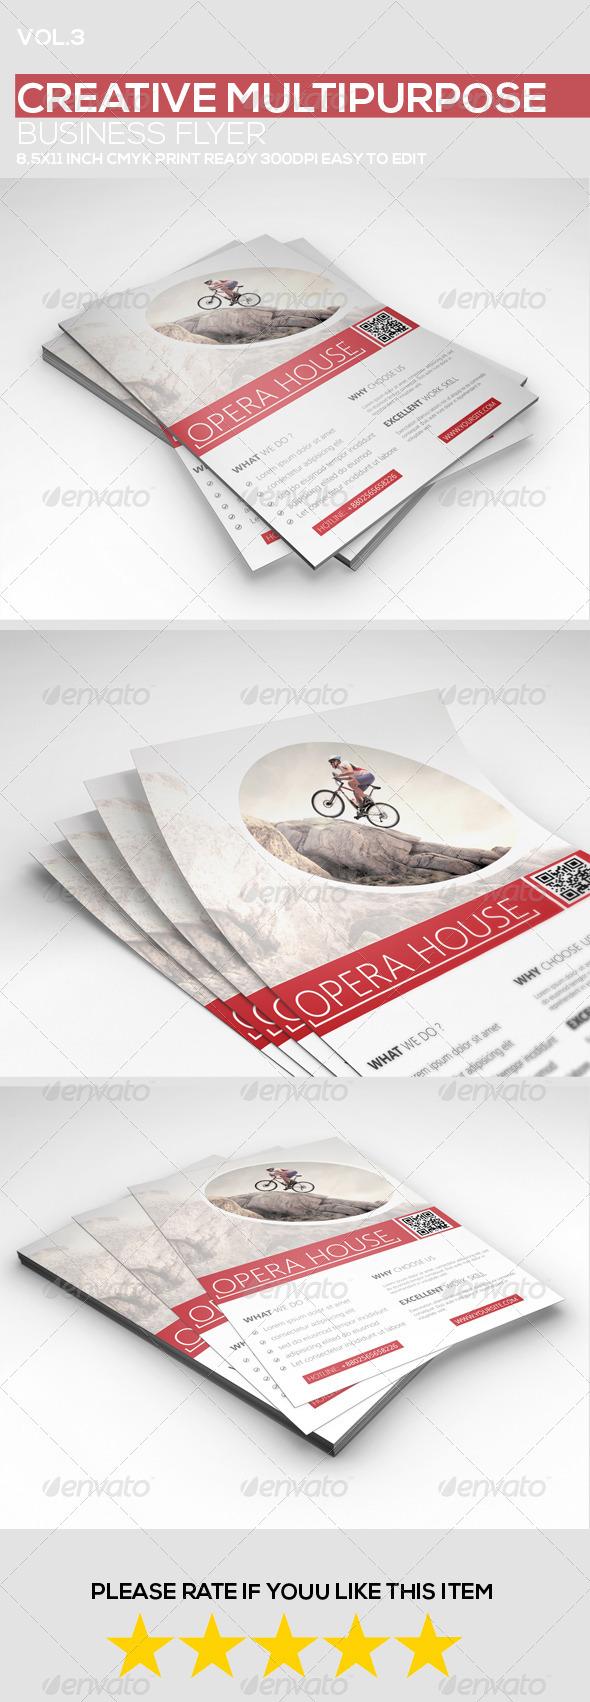 GraphicRiver Creative Multipurpose Business Flyer vol.3 8762978